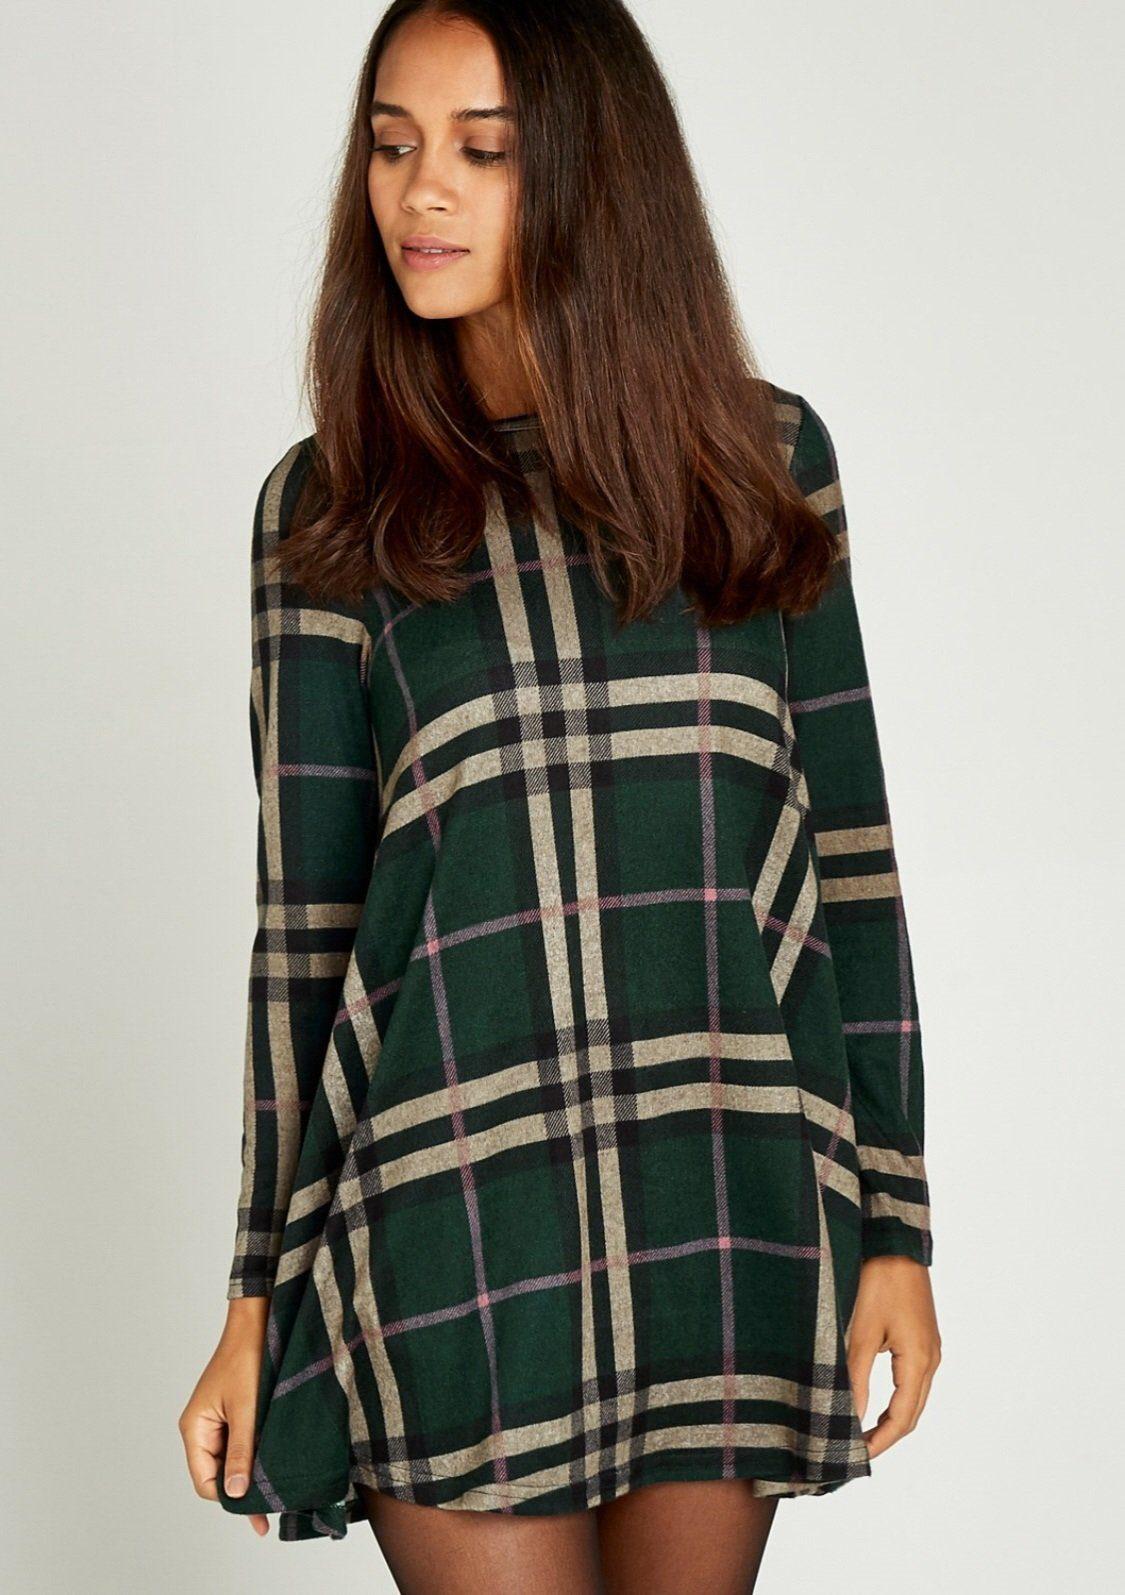 Image of Apricot Strickkleid »Blanket Check Swing Dress«